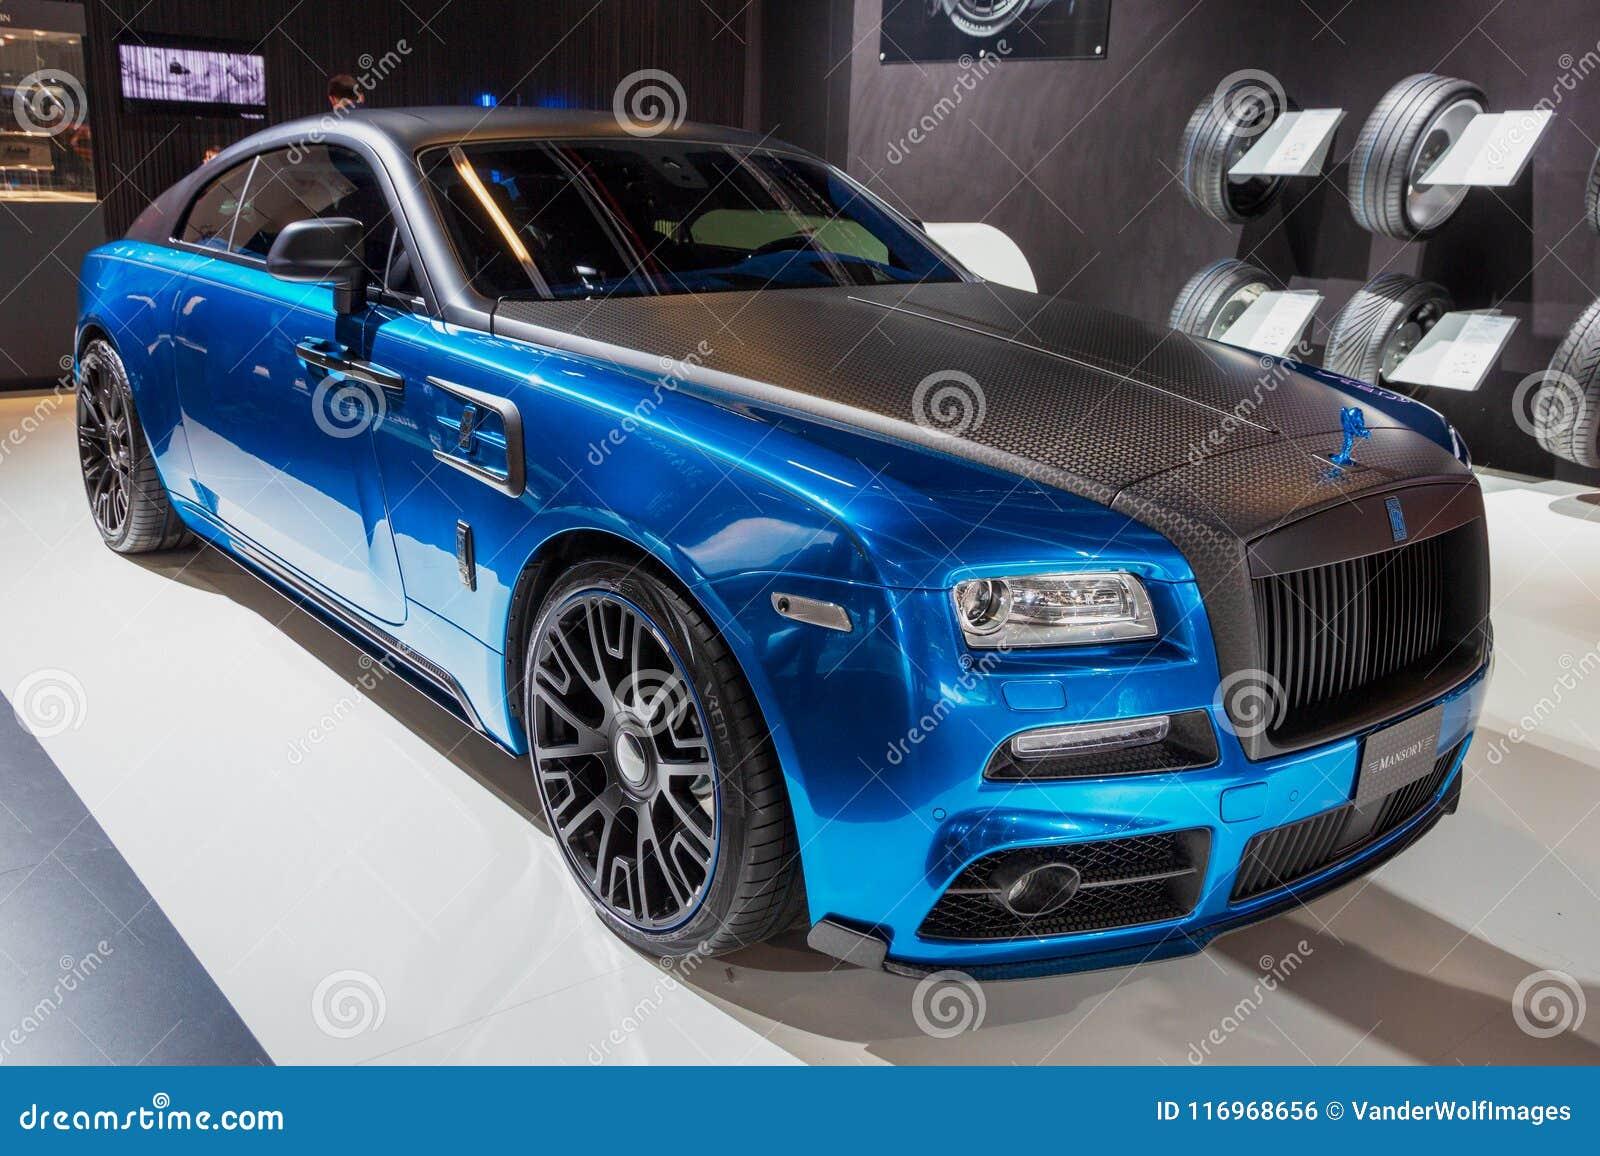 mansory rolls-royce wraith custom luxury car editorial photo - image